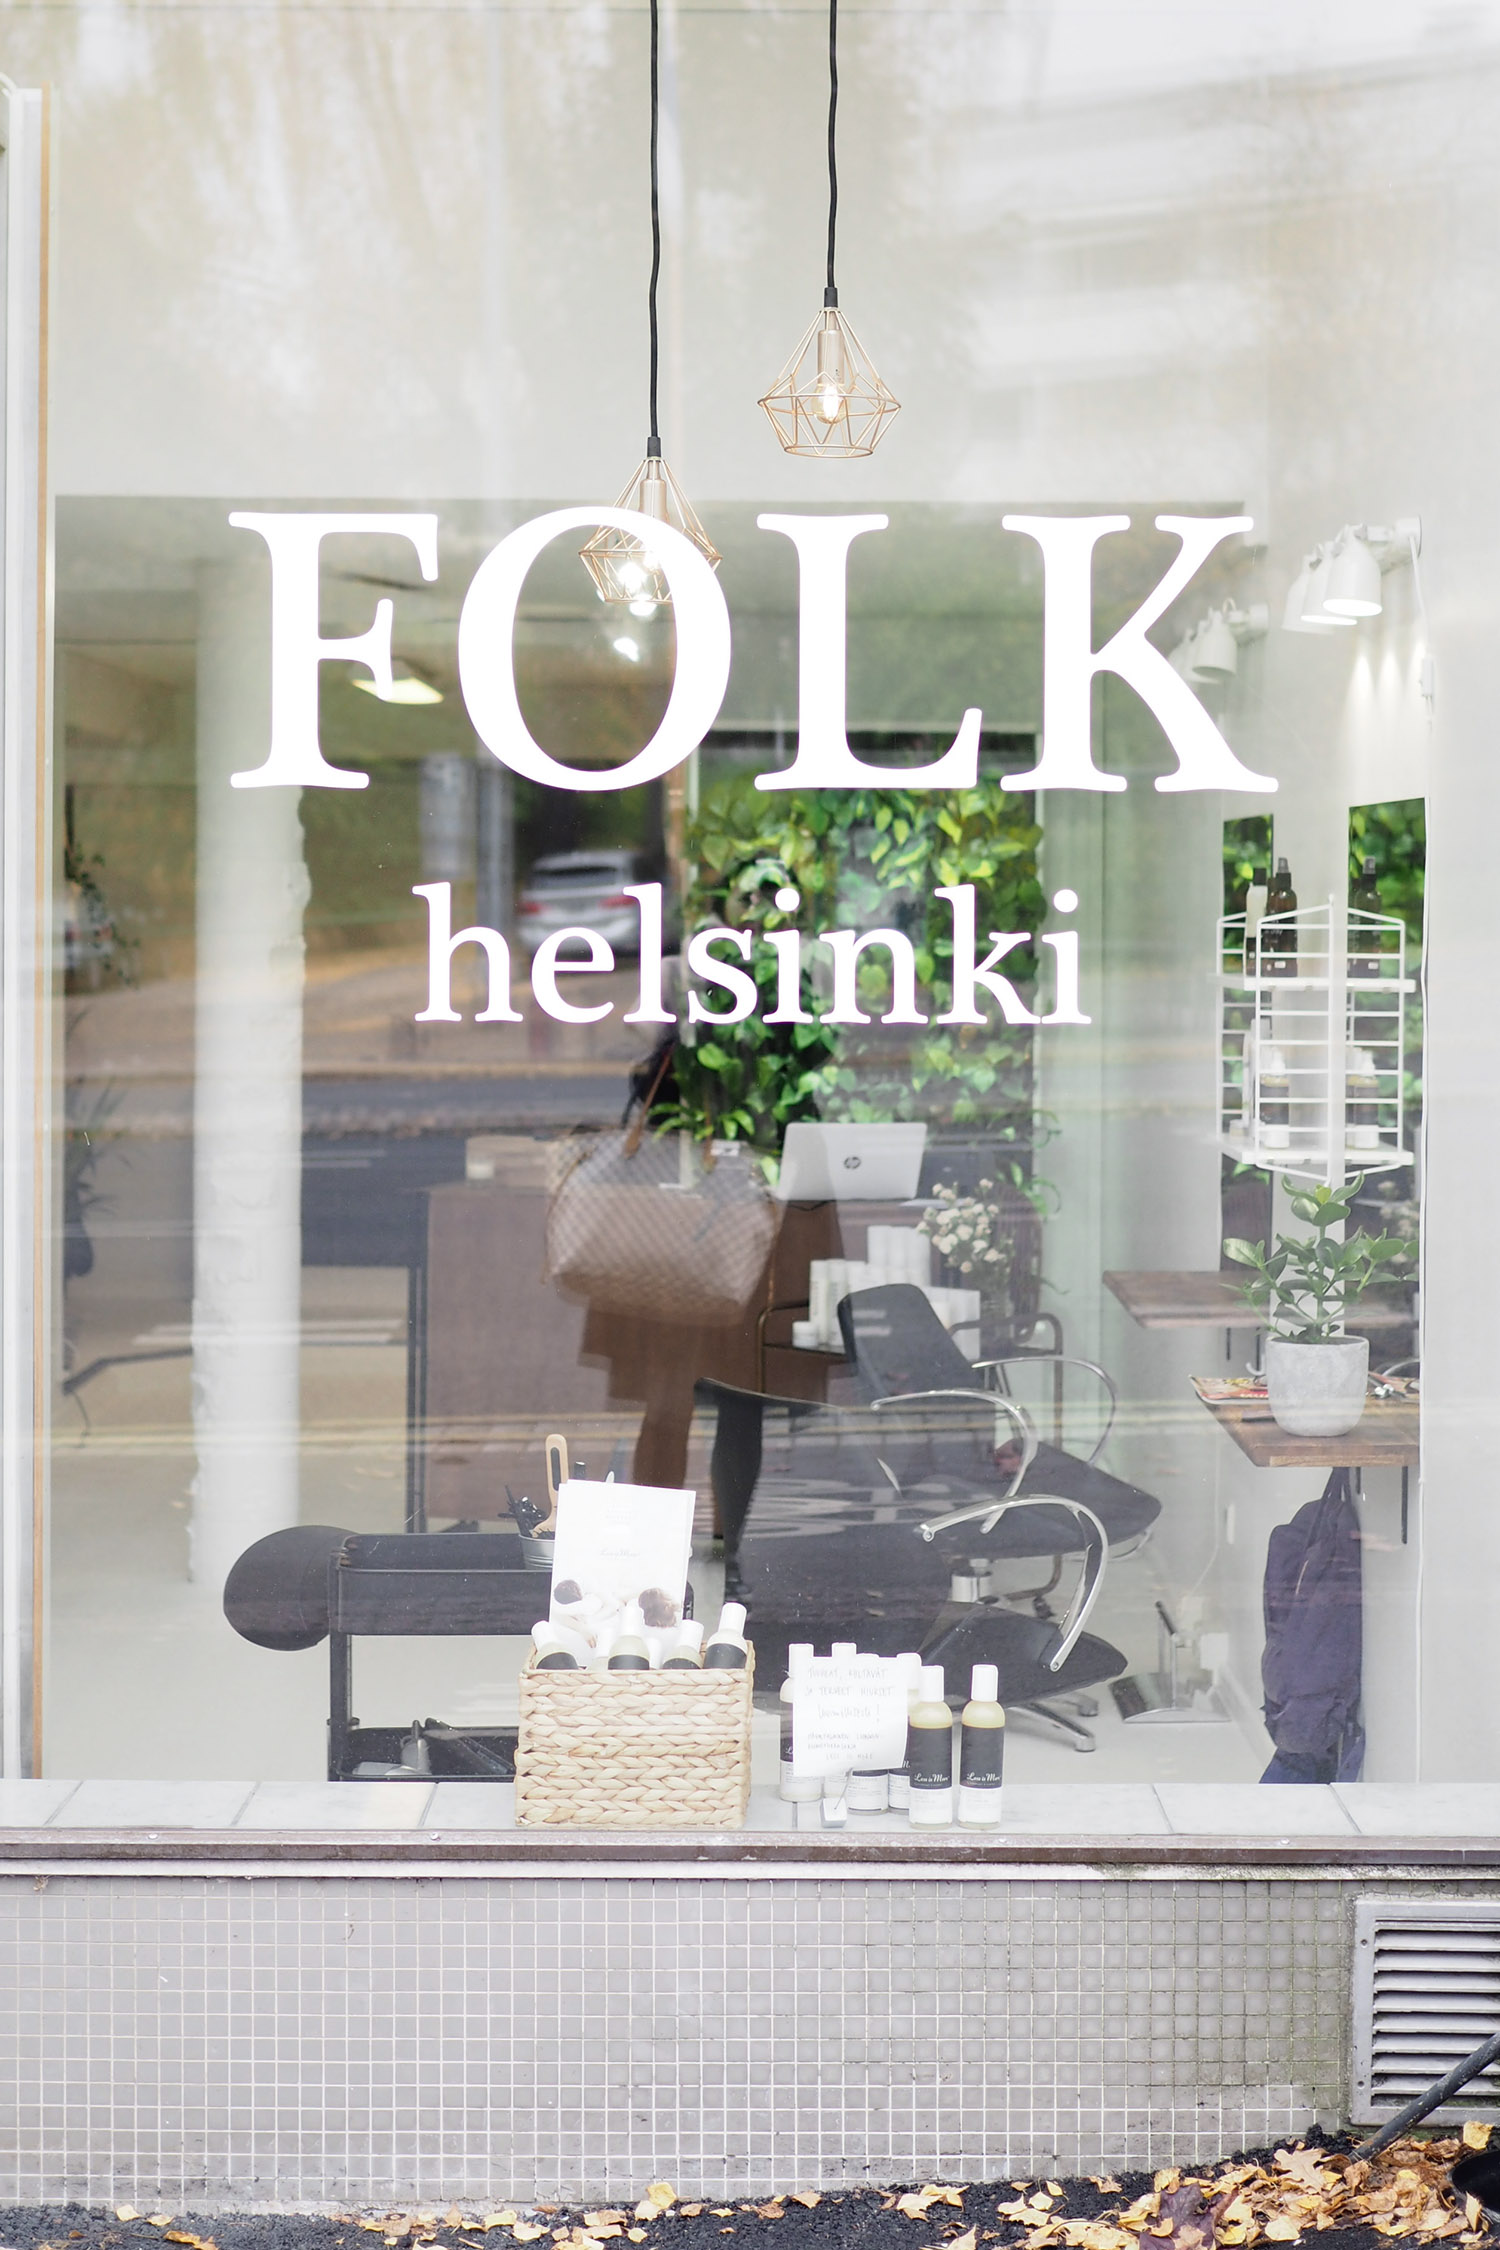 Char and the city, Folk Helsinki, Lauttasaari, Mari - hiukset, kampaamo, balayage, glossing, olaplex, ombre